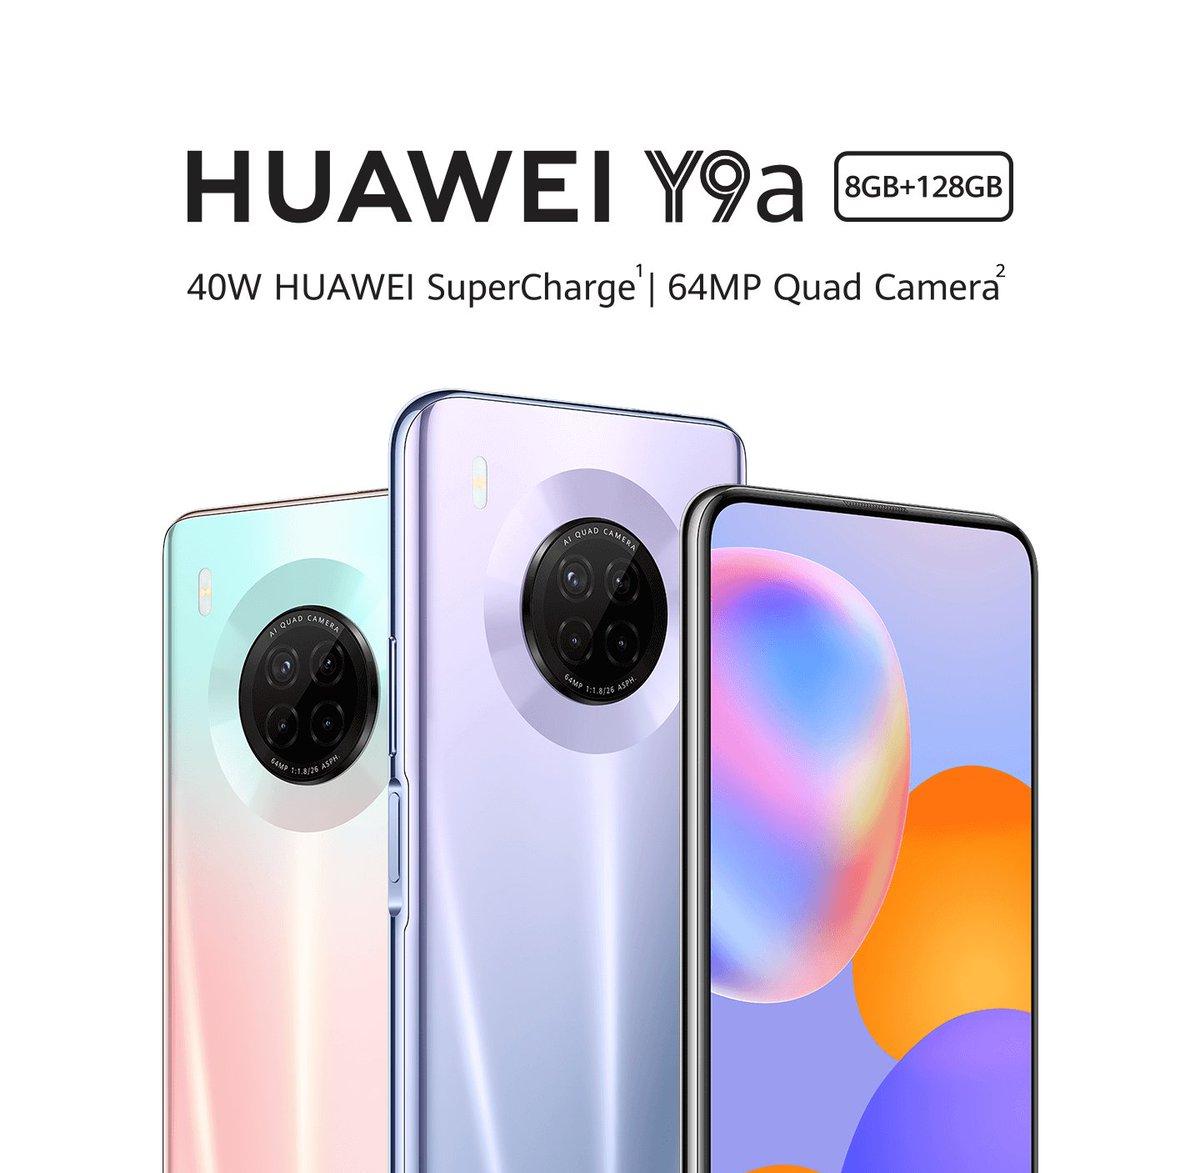 #Huawei Ultra FullView Display Notch-less Display,Boundless Fun https://t.co/9VEpWjdWS3 6.63